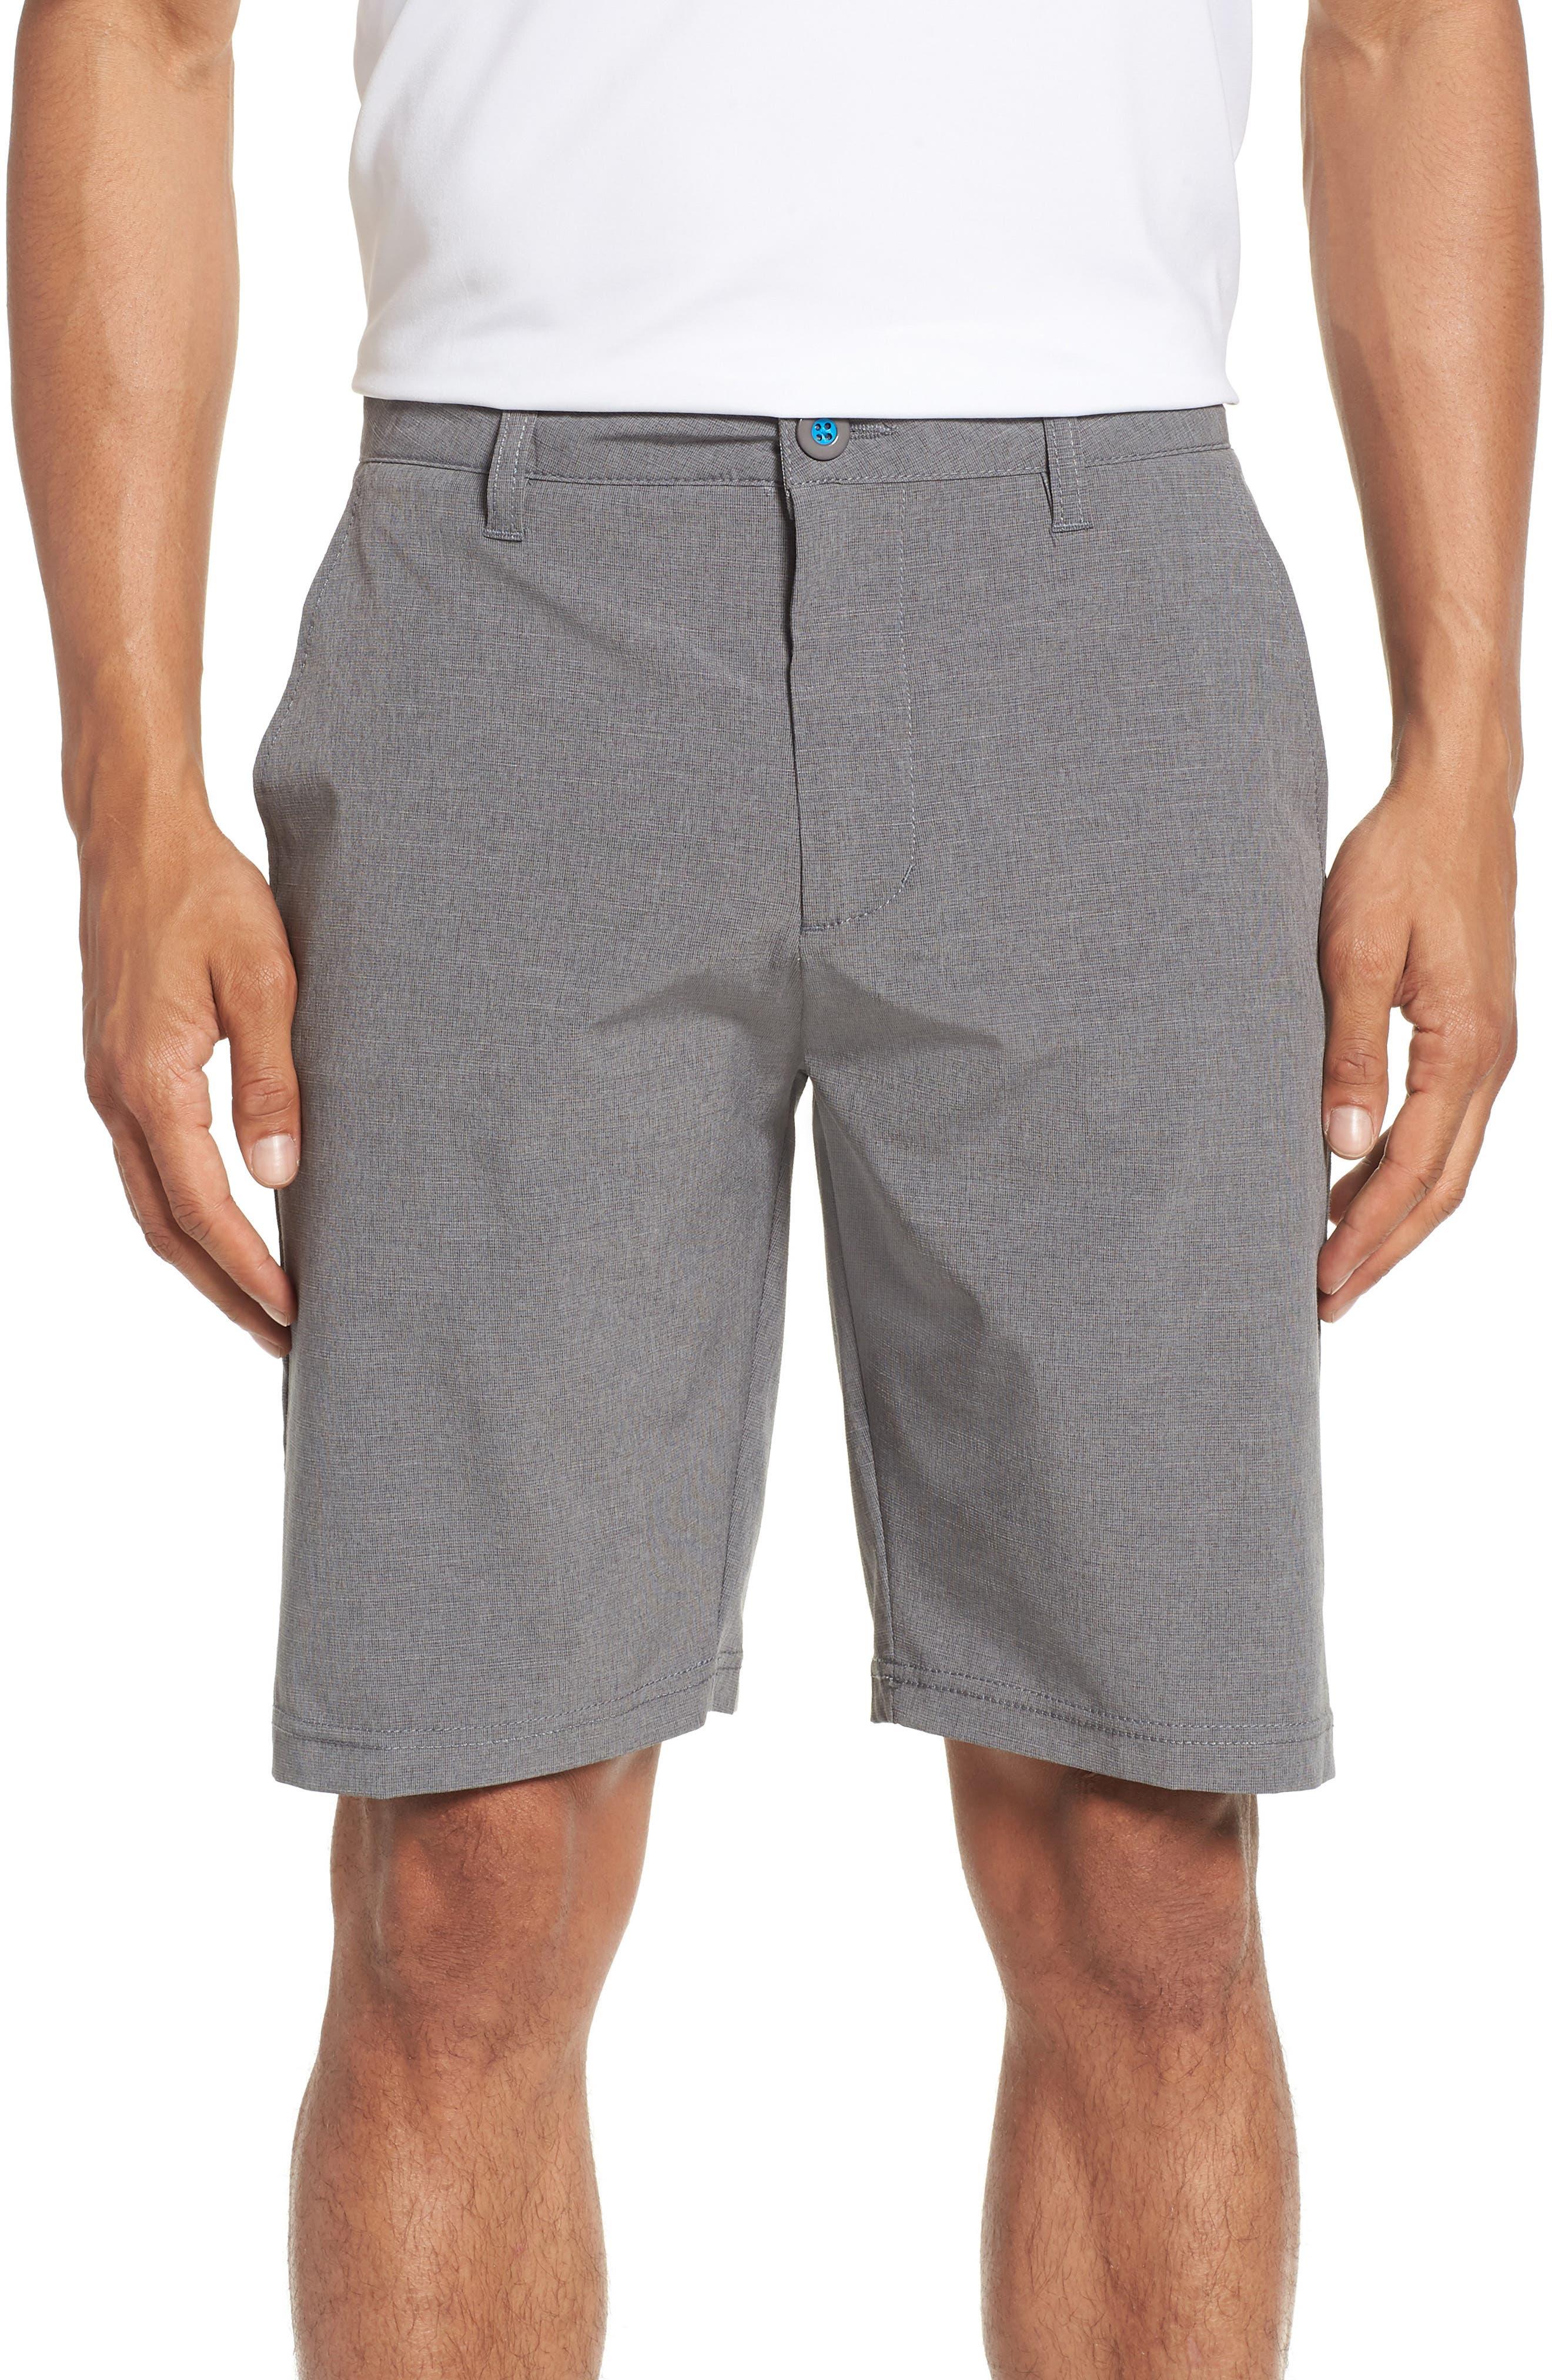 Cruiser Hybrid Shorts,                             Main thumbnail 1, color,                             CHARCOAL